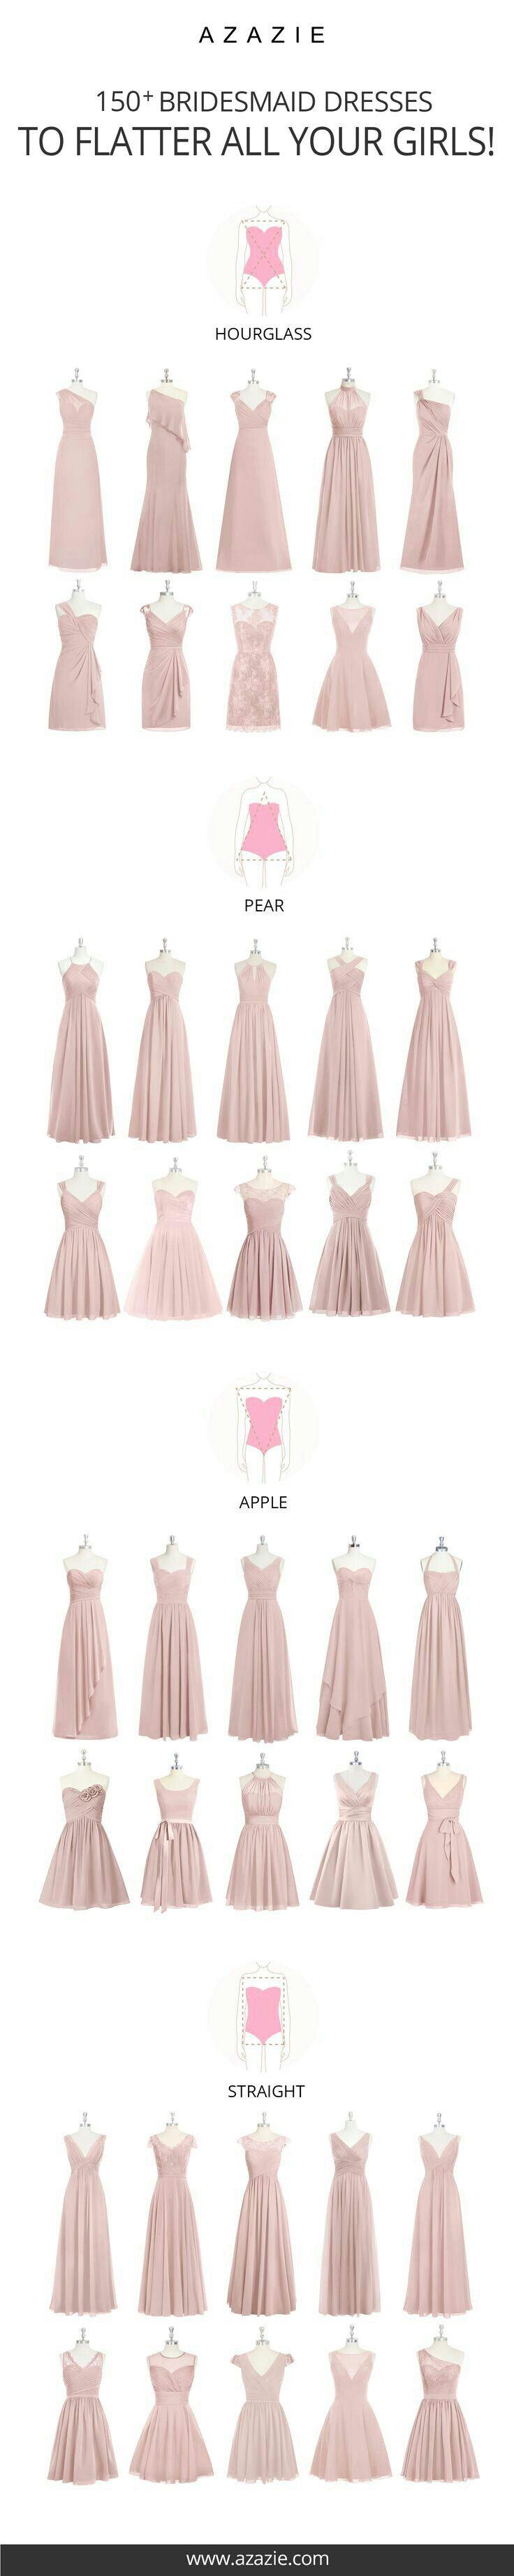 Wedding dress for body type  Pin by Shaneta Becker on I like it ok Love it LOL  Pinterest